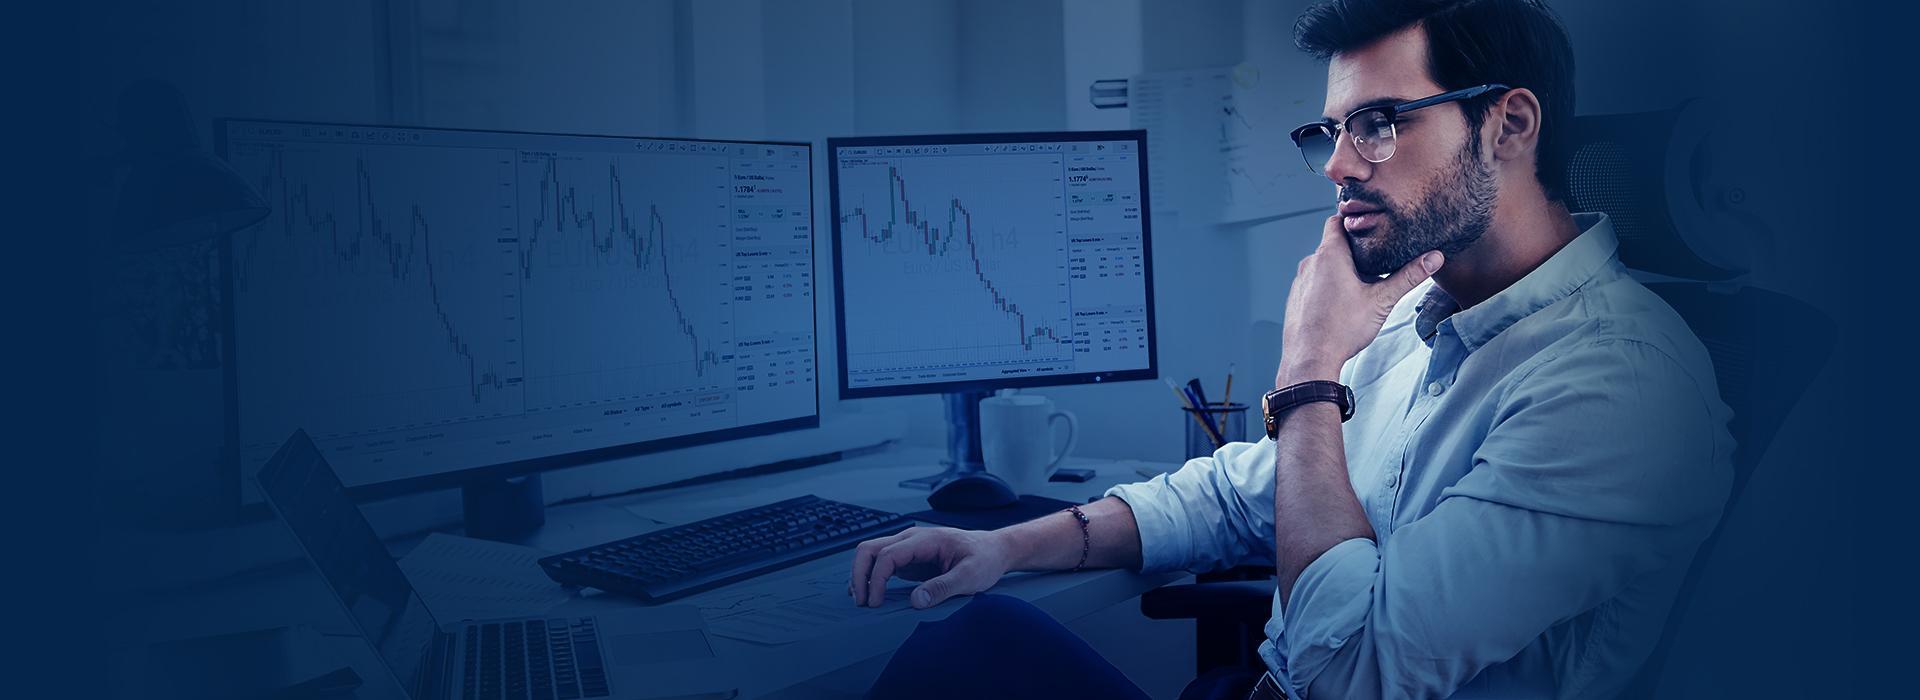 Фондовий ринок. Просунута торгівля